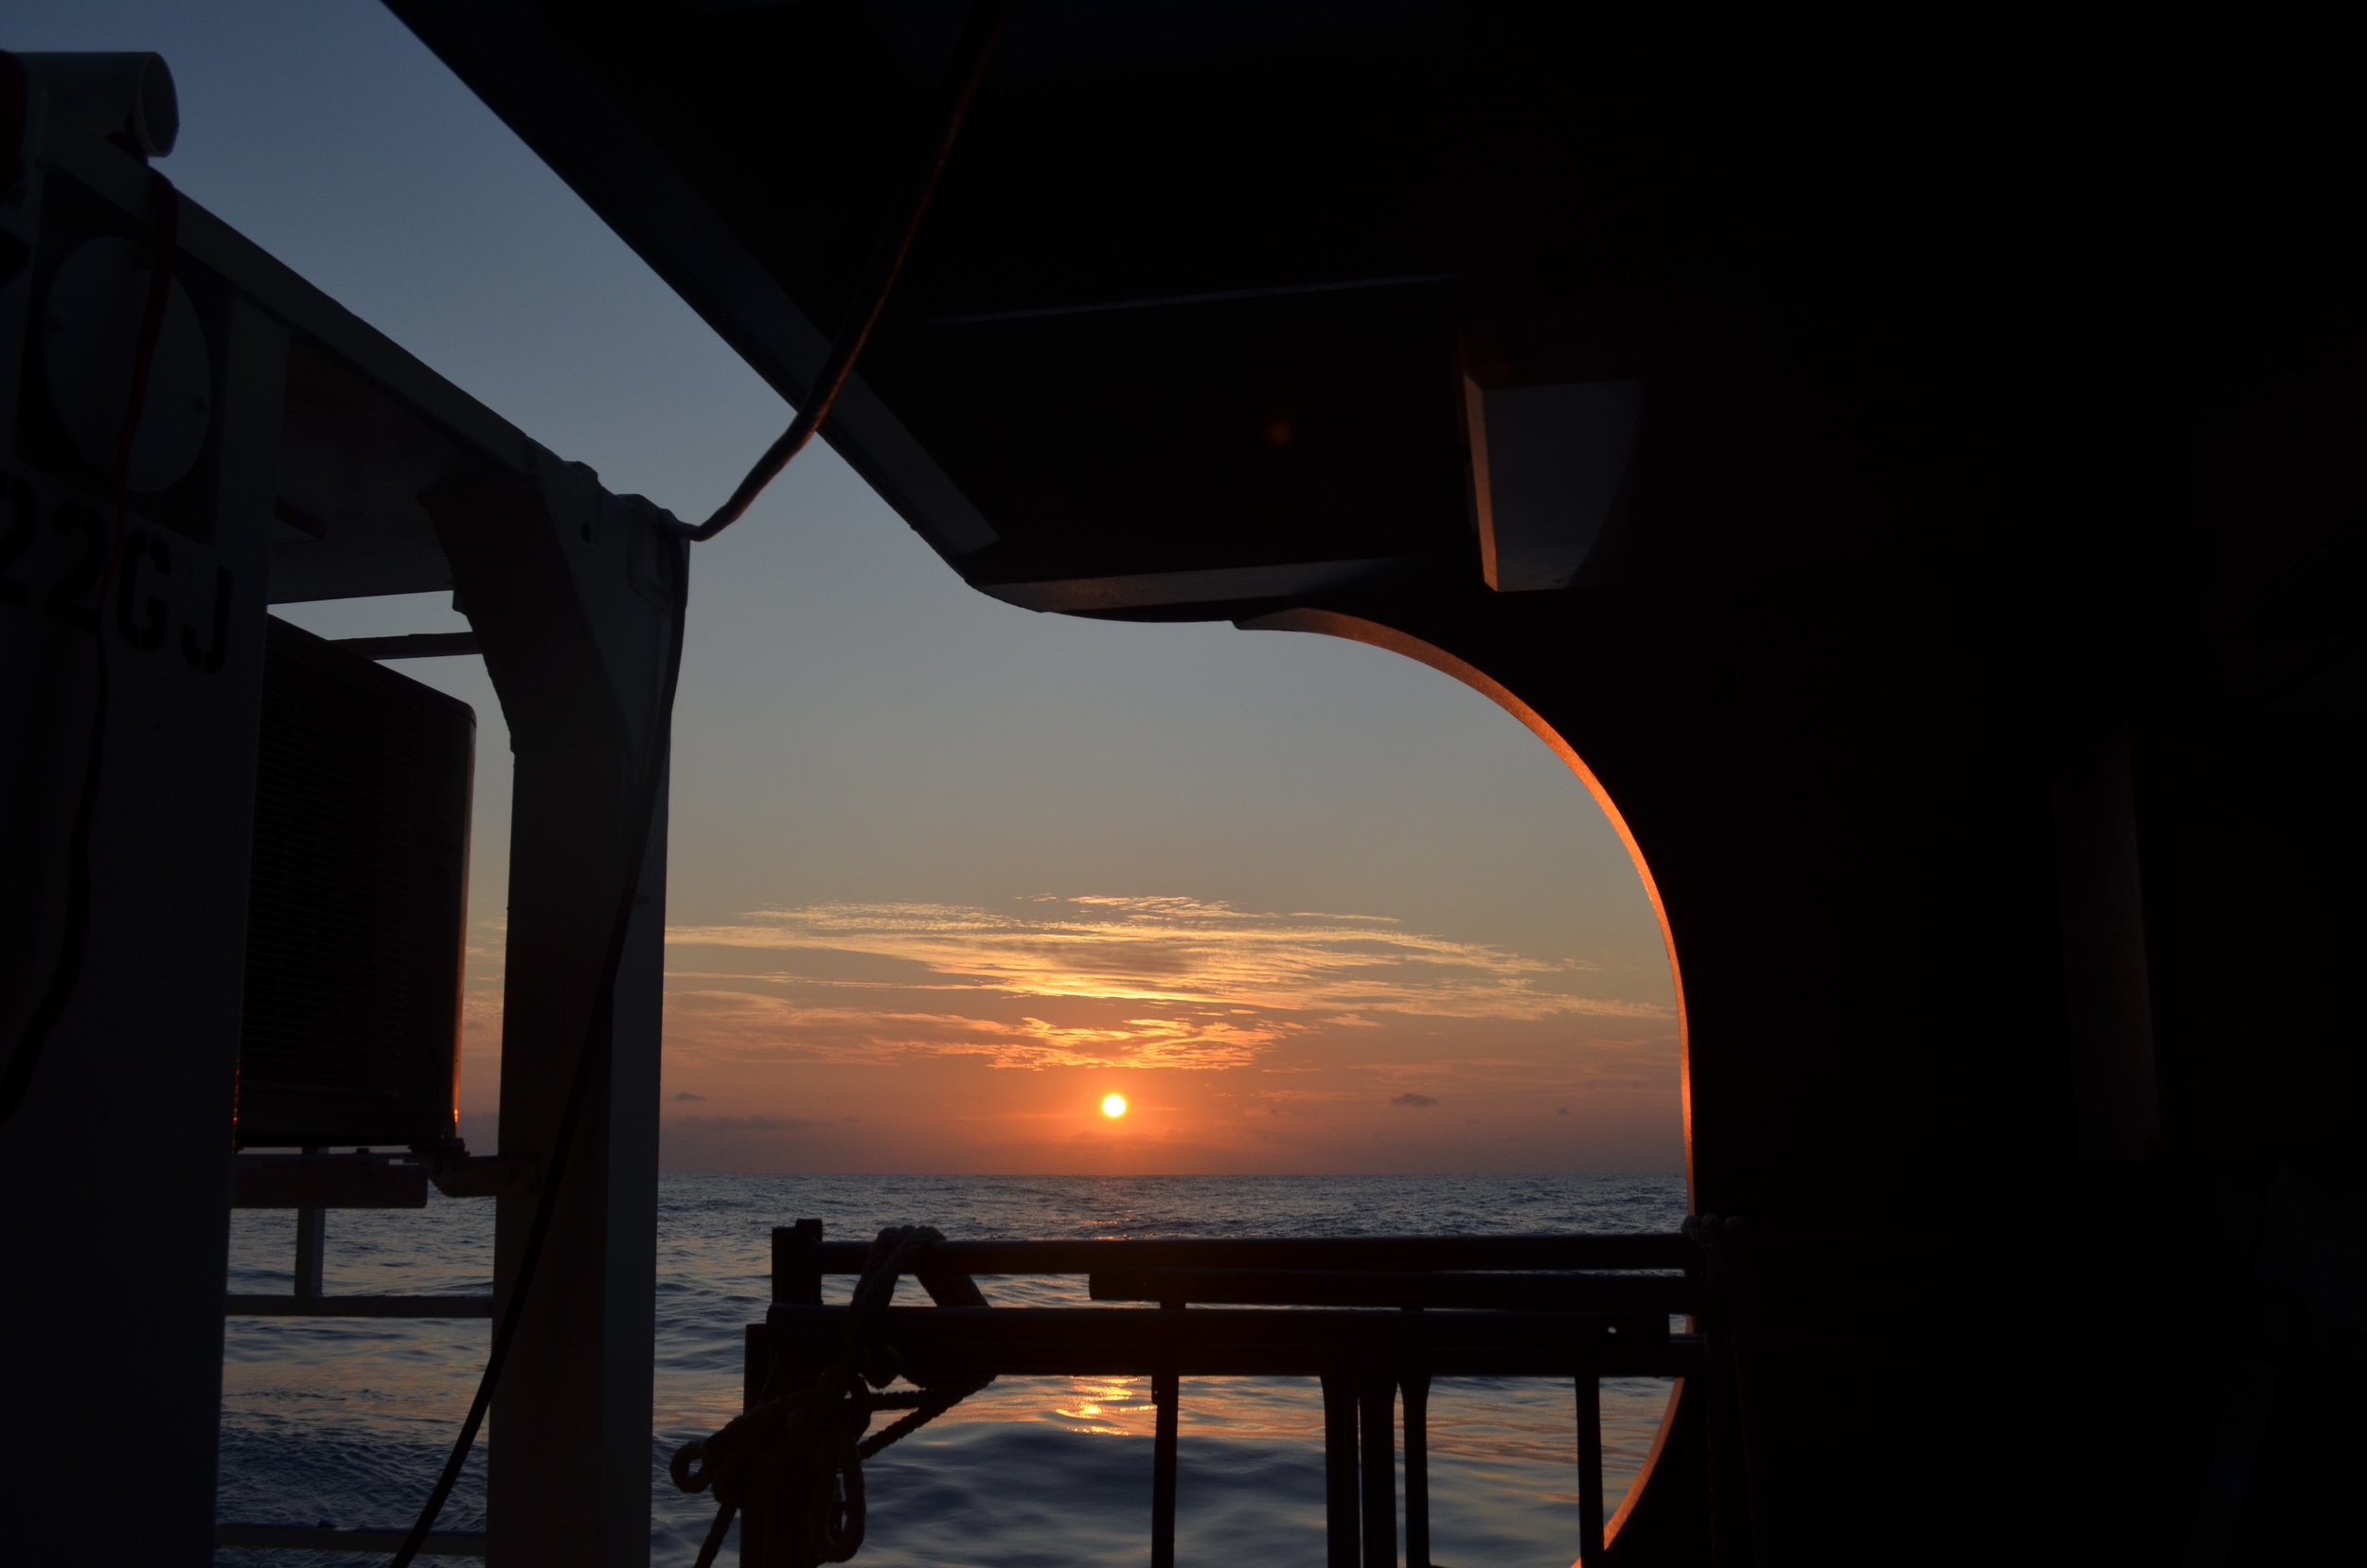 Just another sunrise on the Sargasso Sea. Photo by Mariko McNamara.